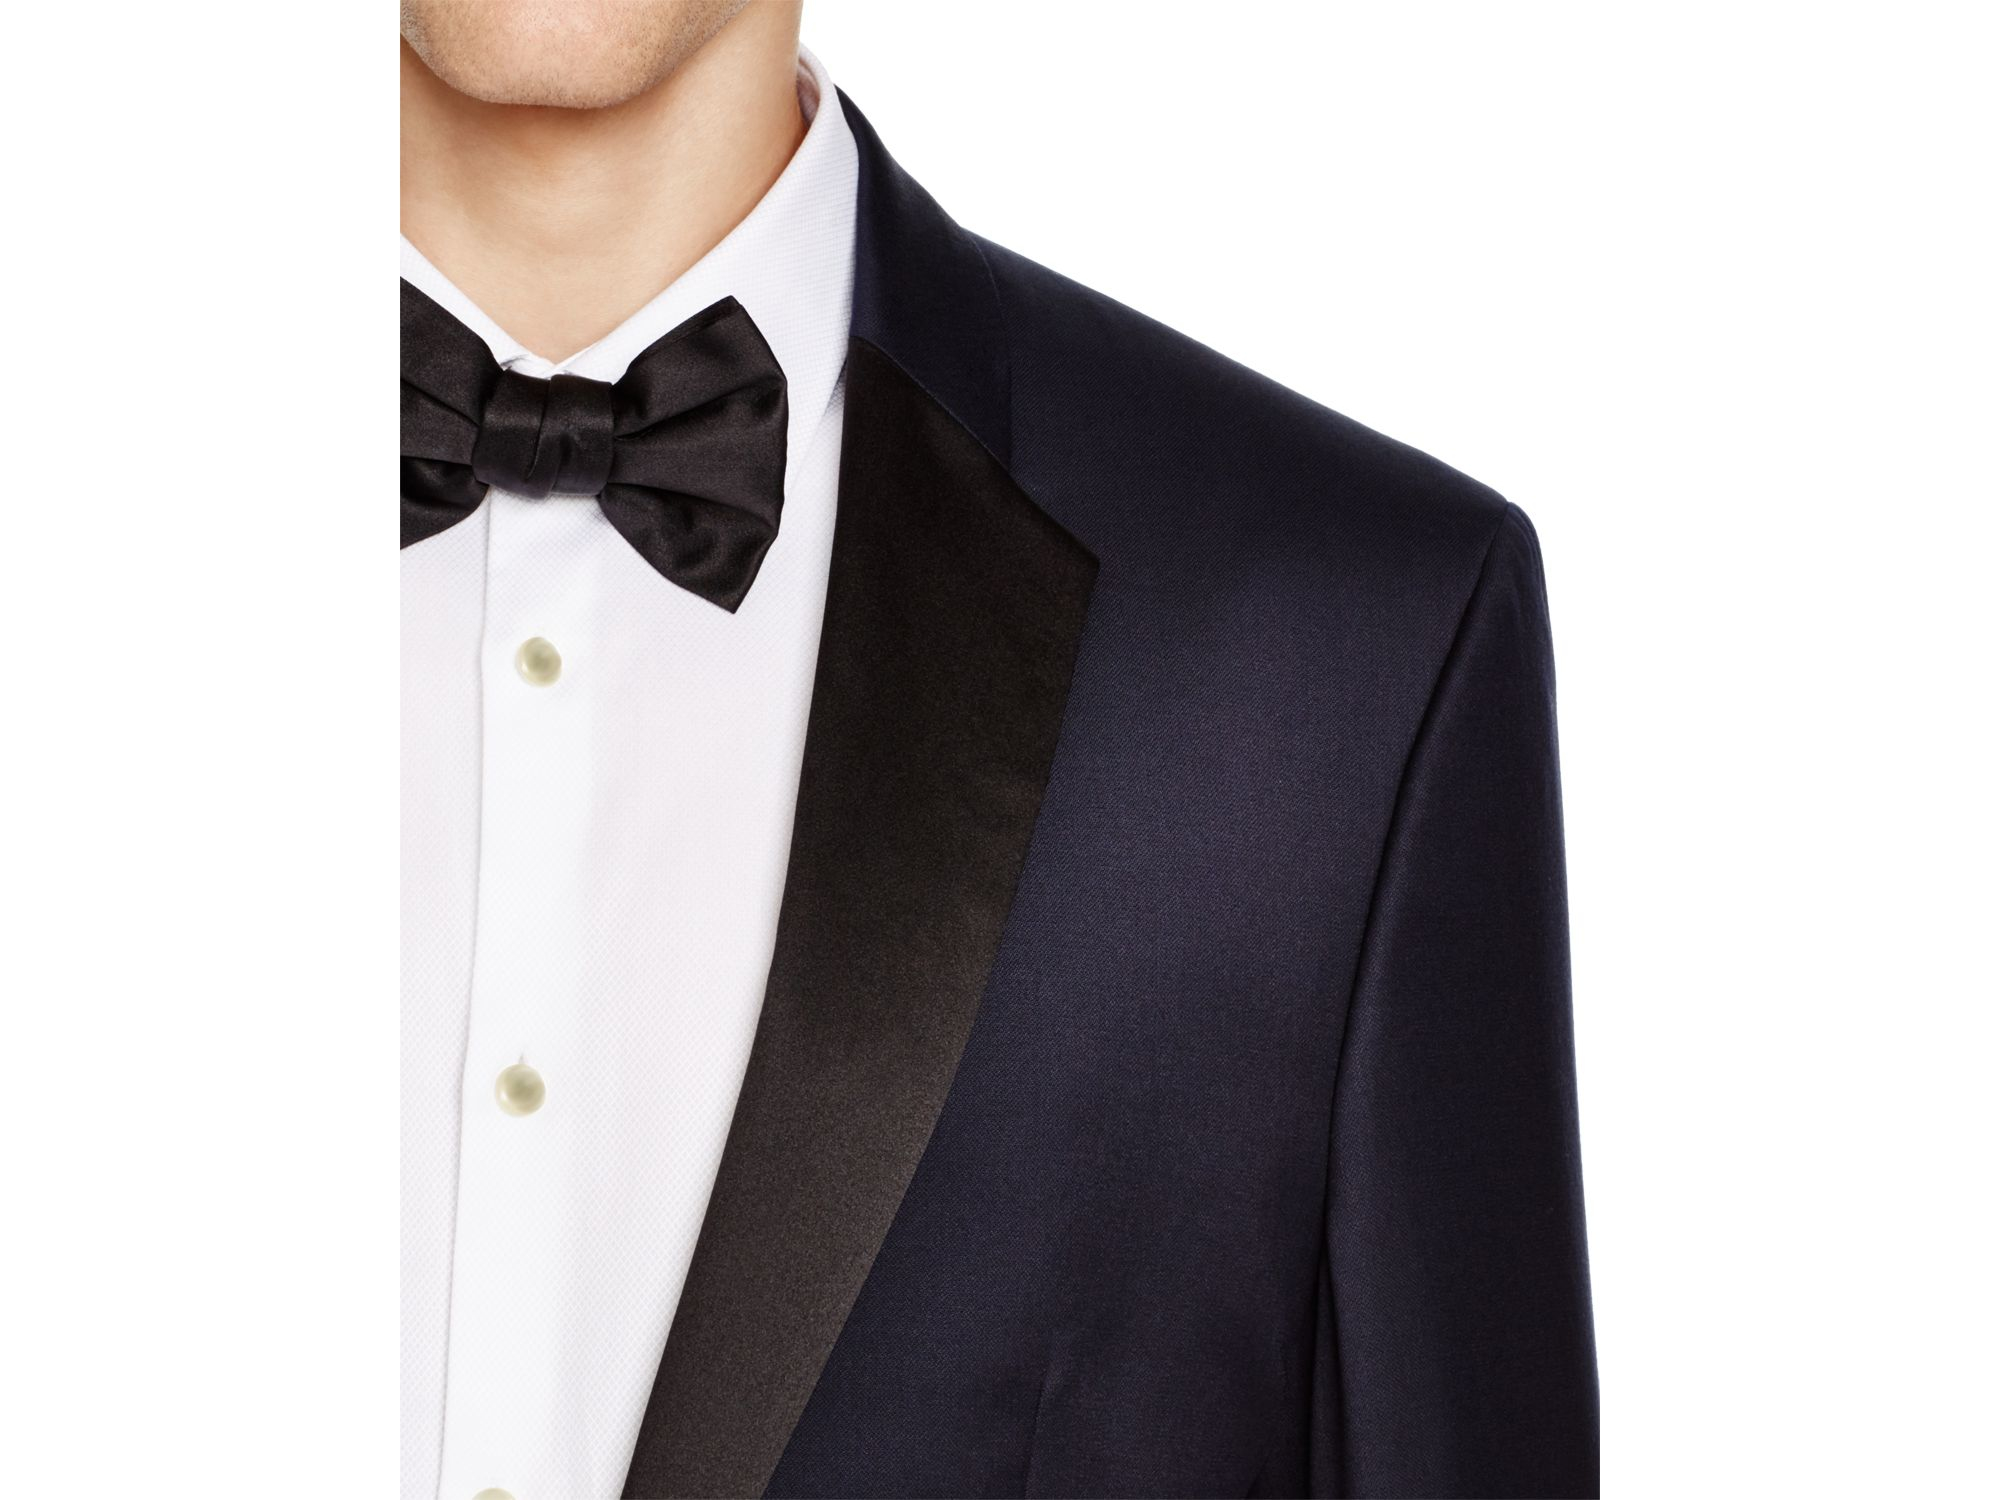 lyst boss hugo slim fit tuxedo in blue for men. Black Bedroom Furniture Sets. Home Design Ideas